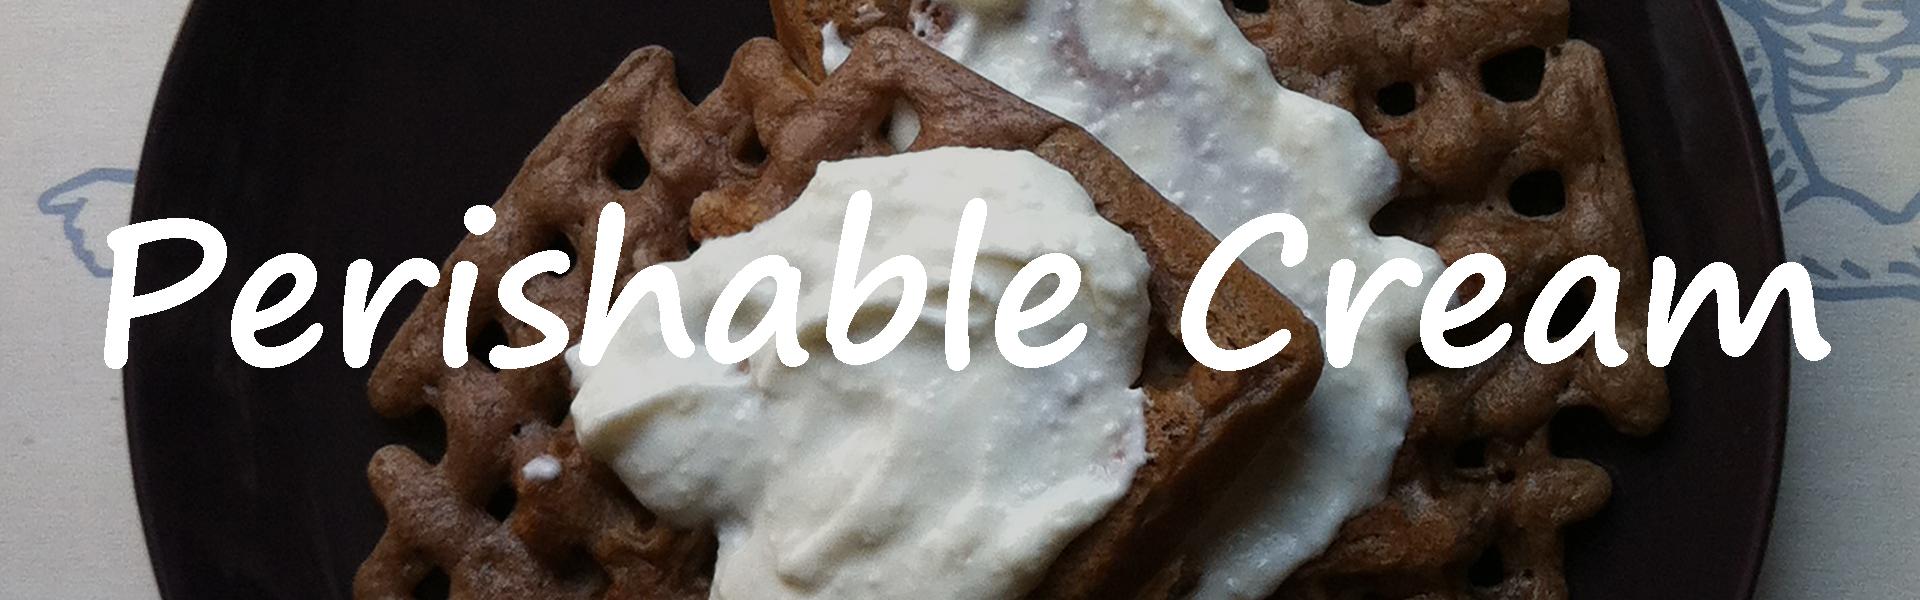 web-ready-perishable-cream-1